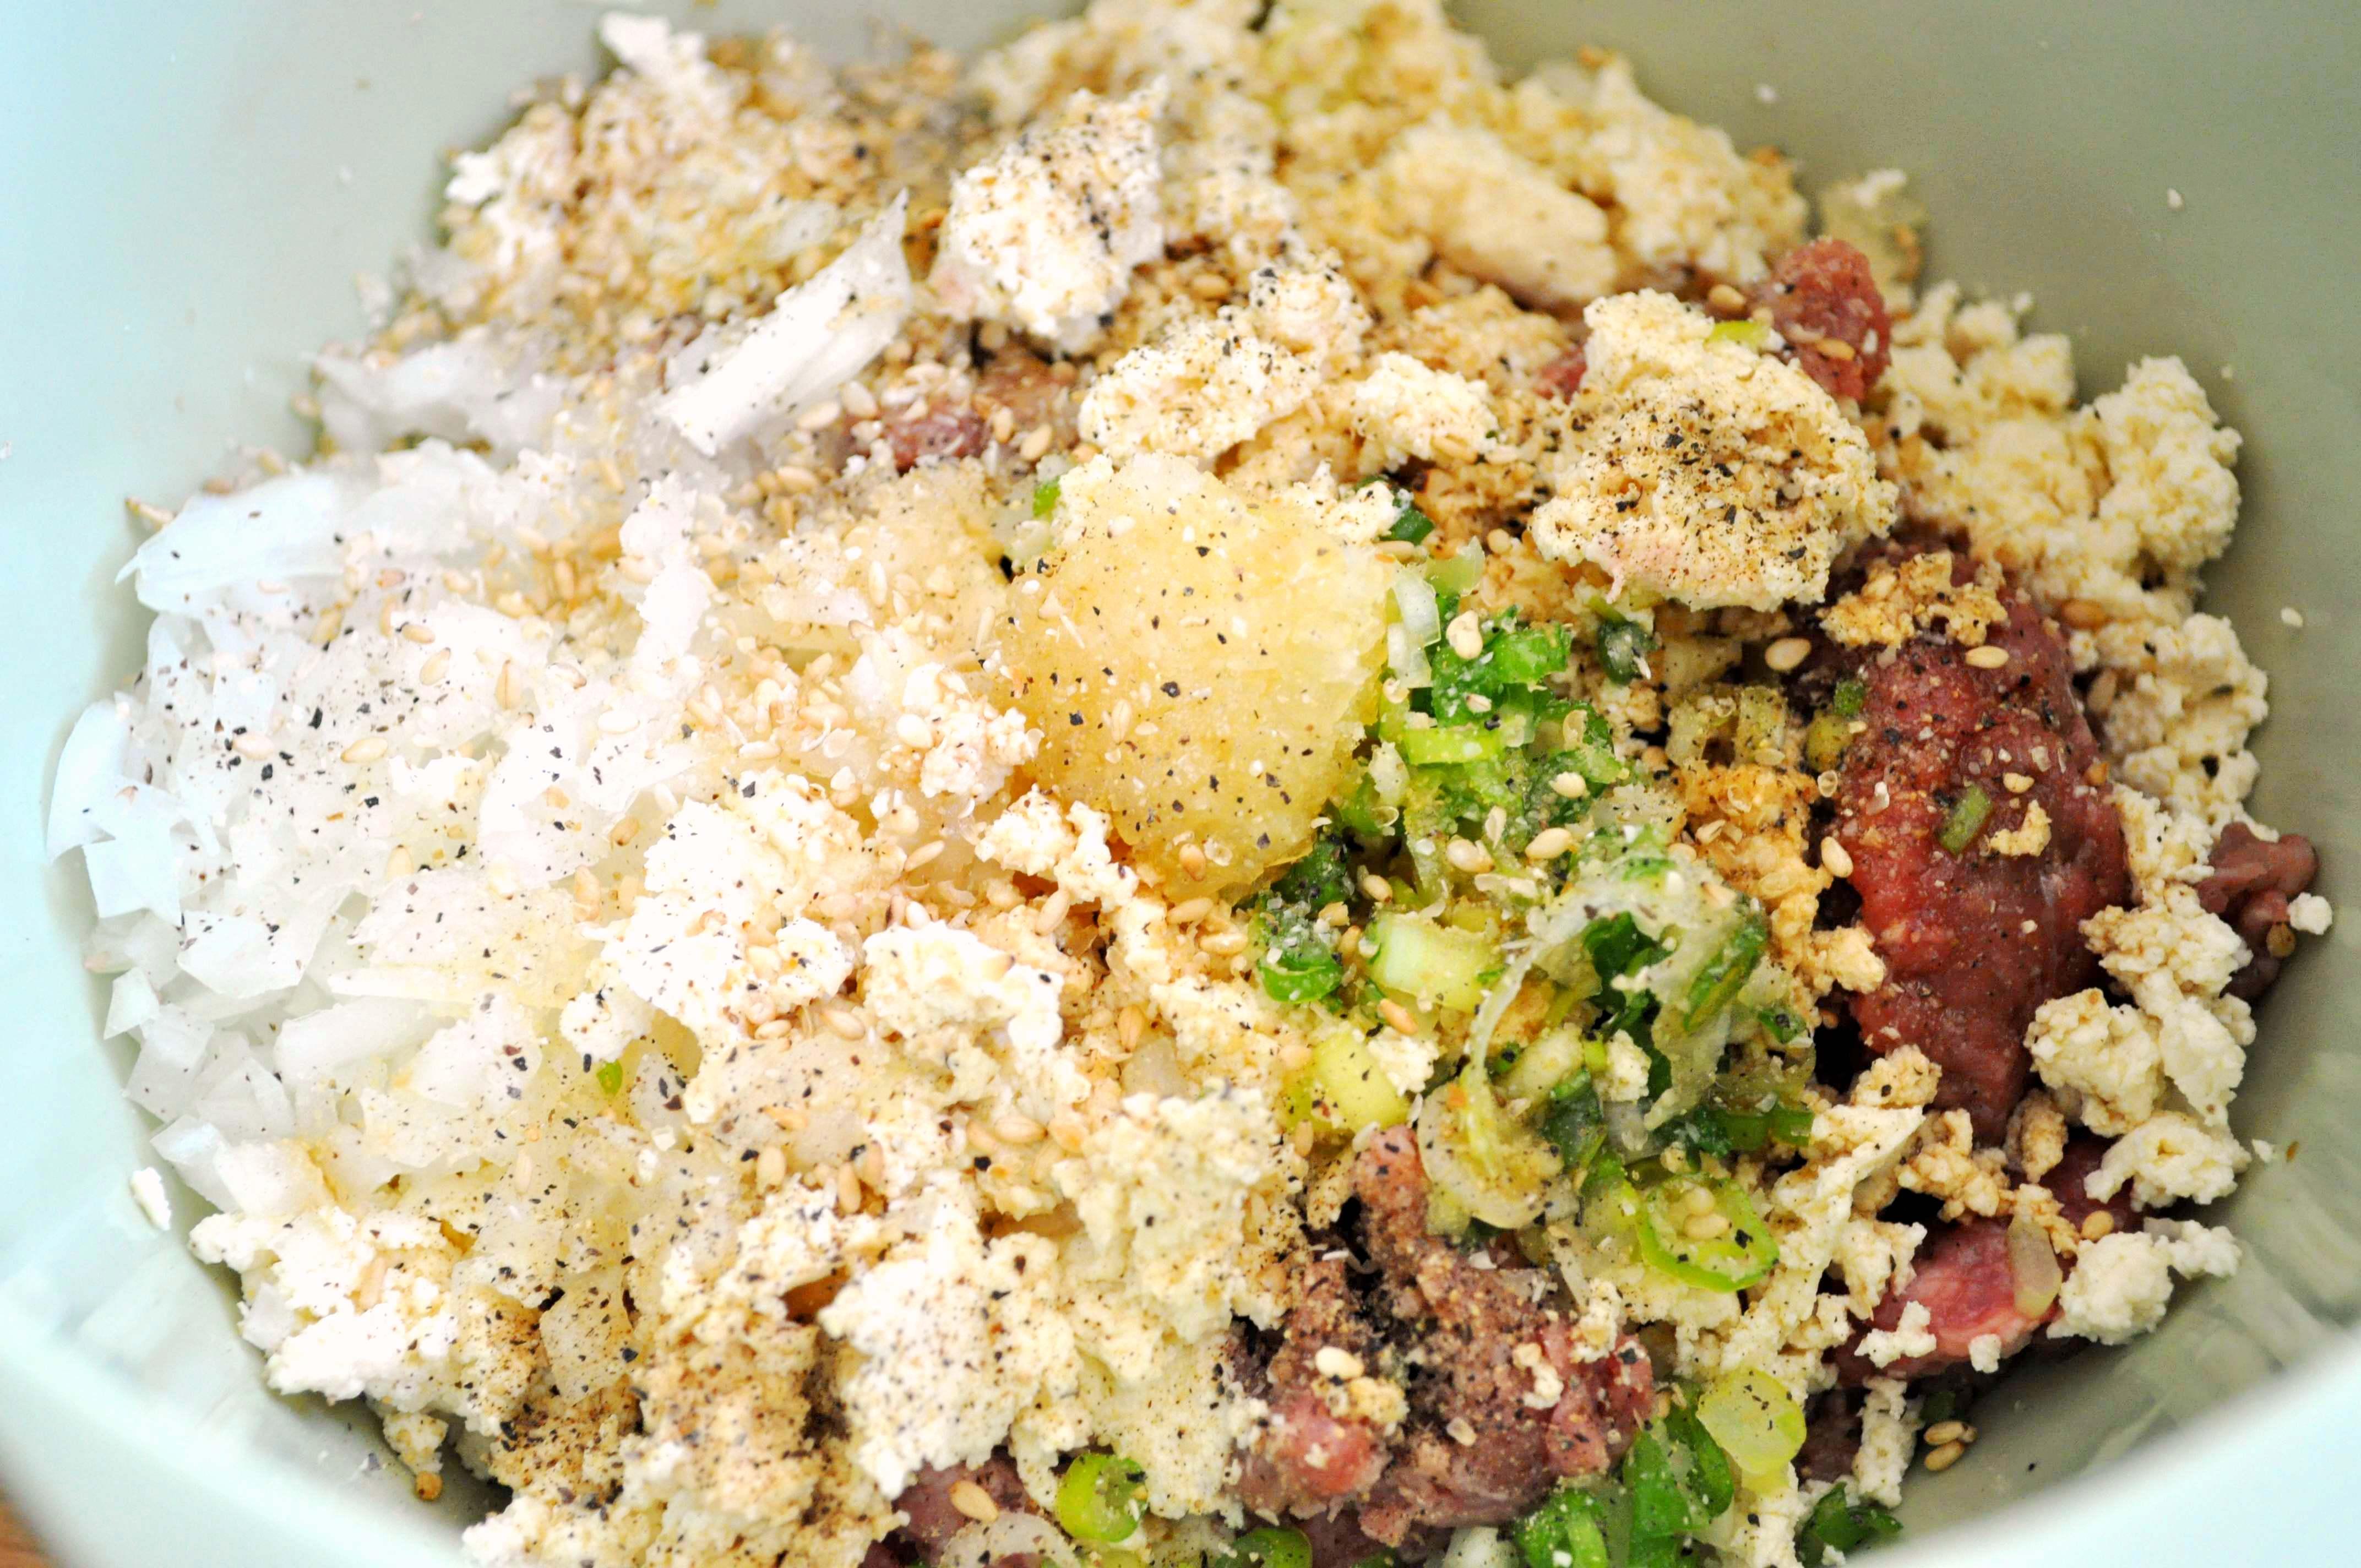 Ground meat and seasonings